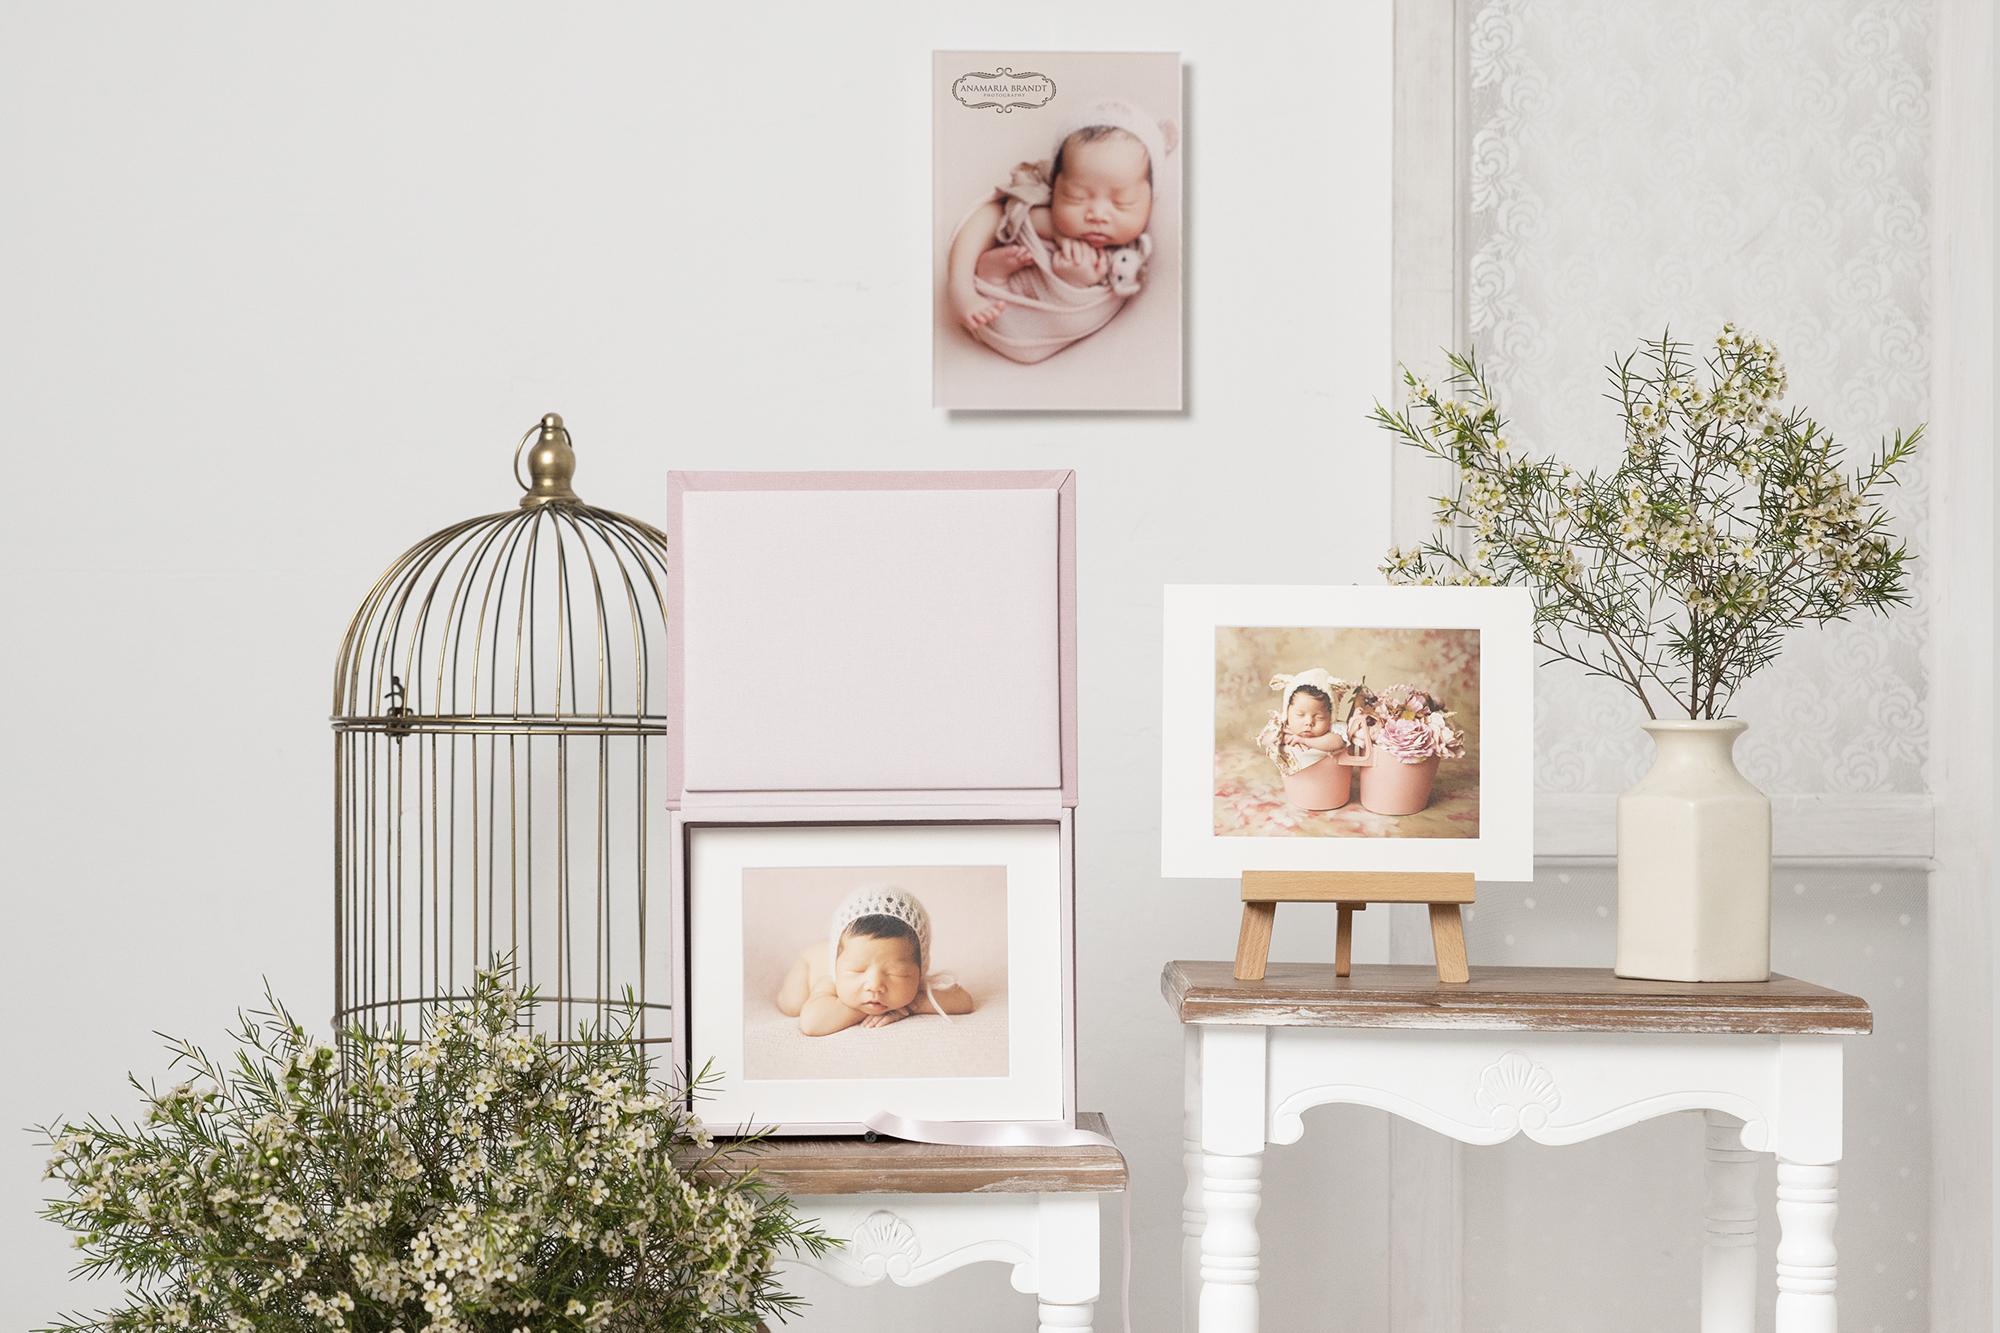 Acrylic Photo Prints with Professional Newborn Photography